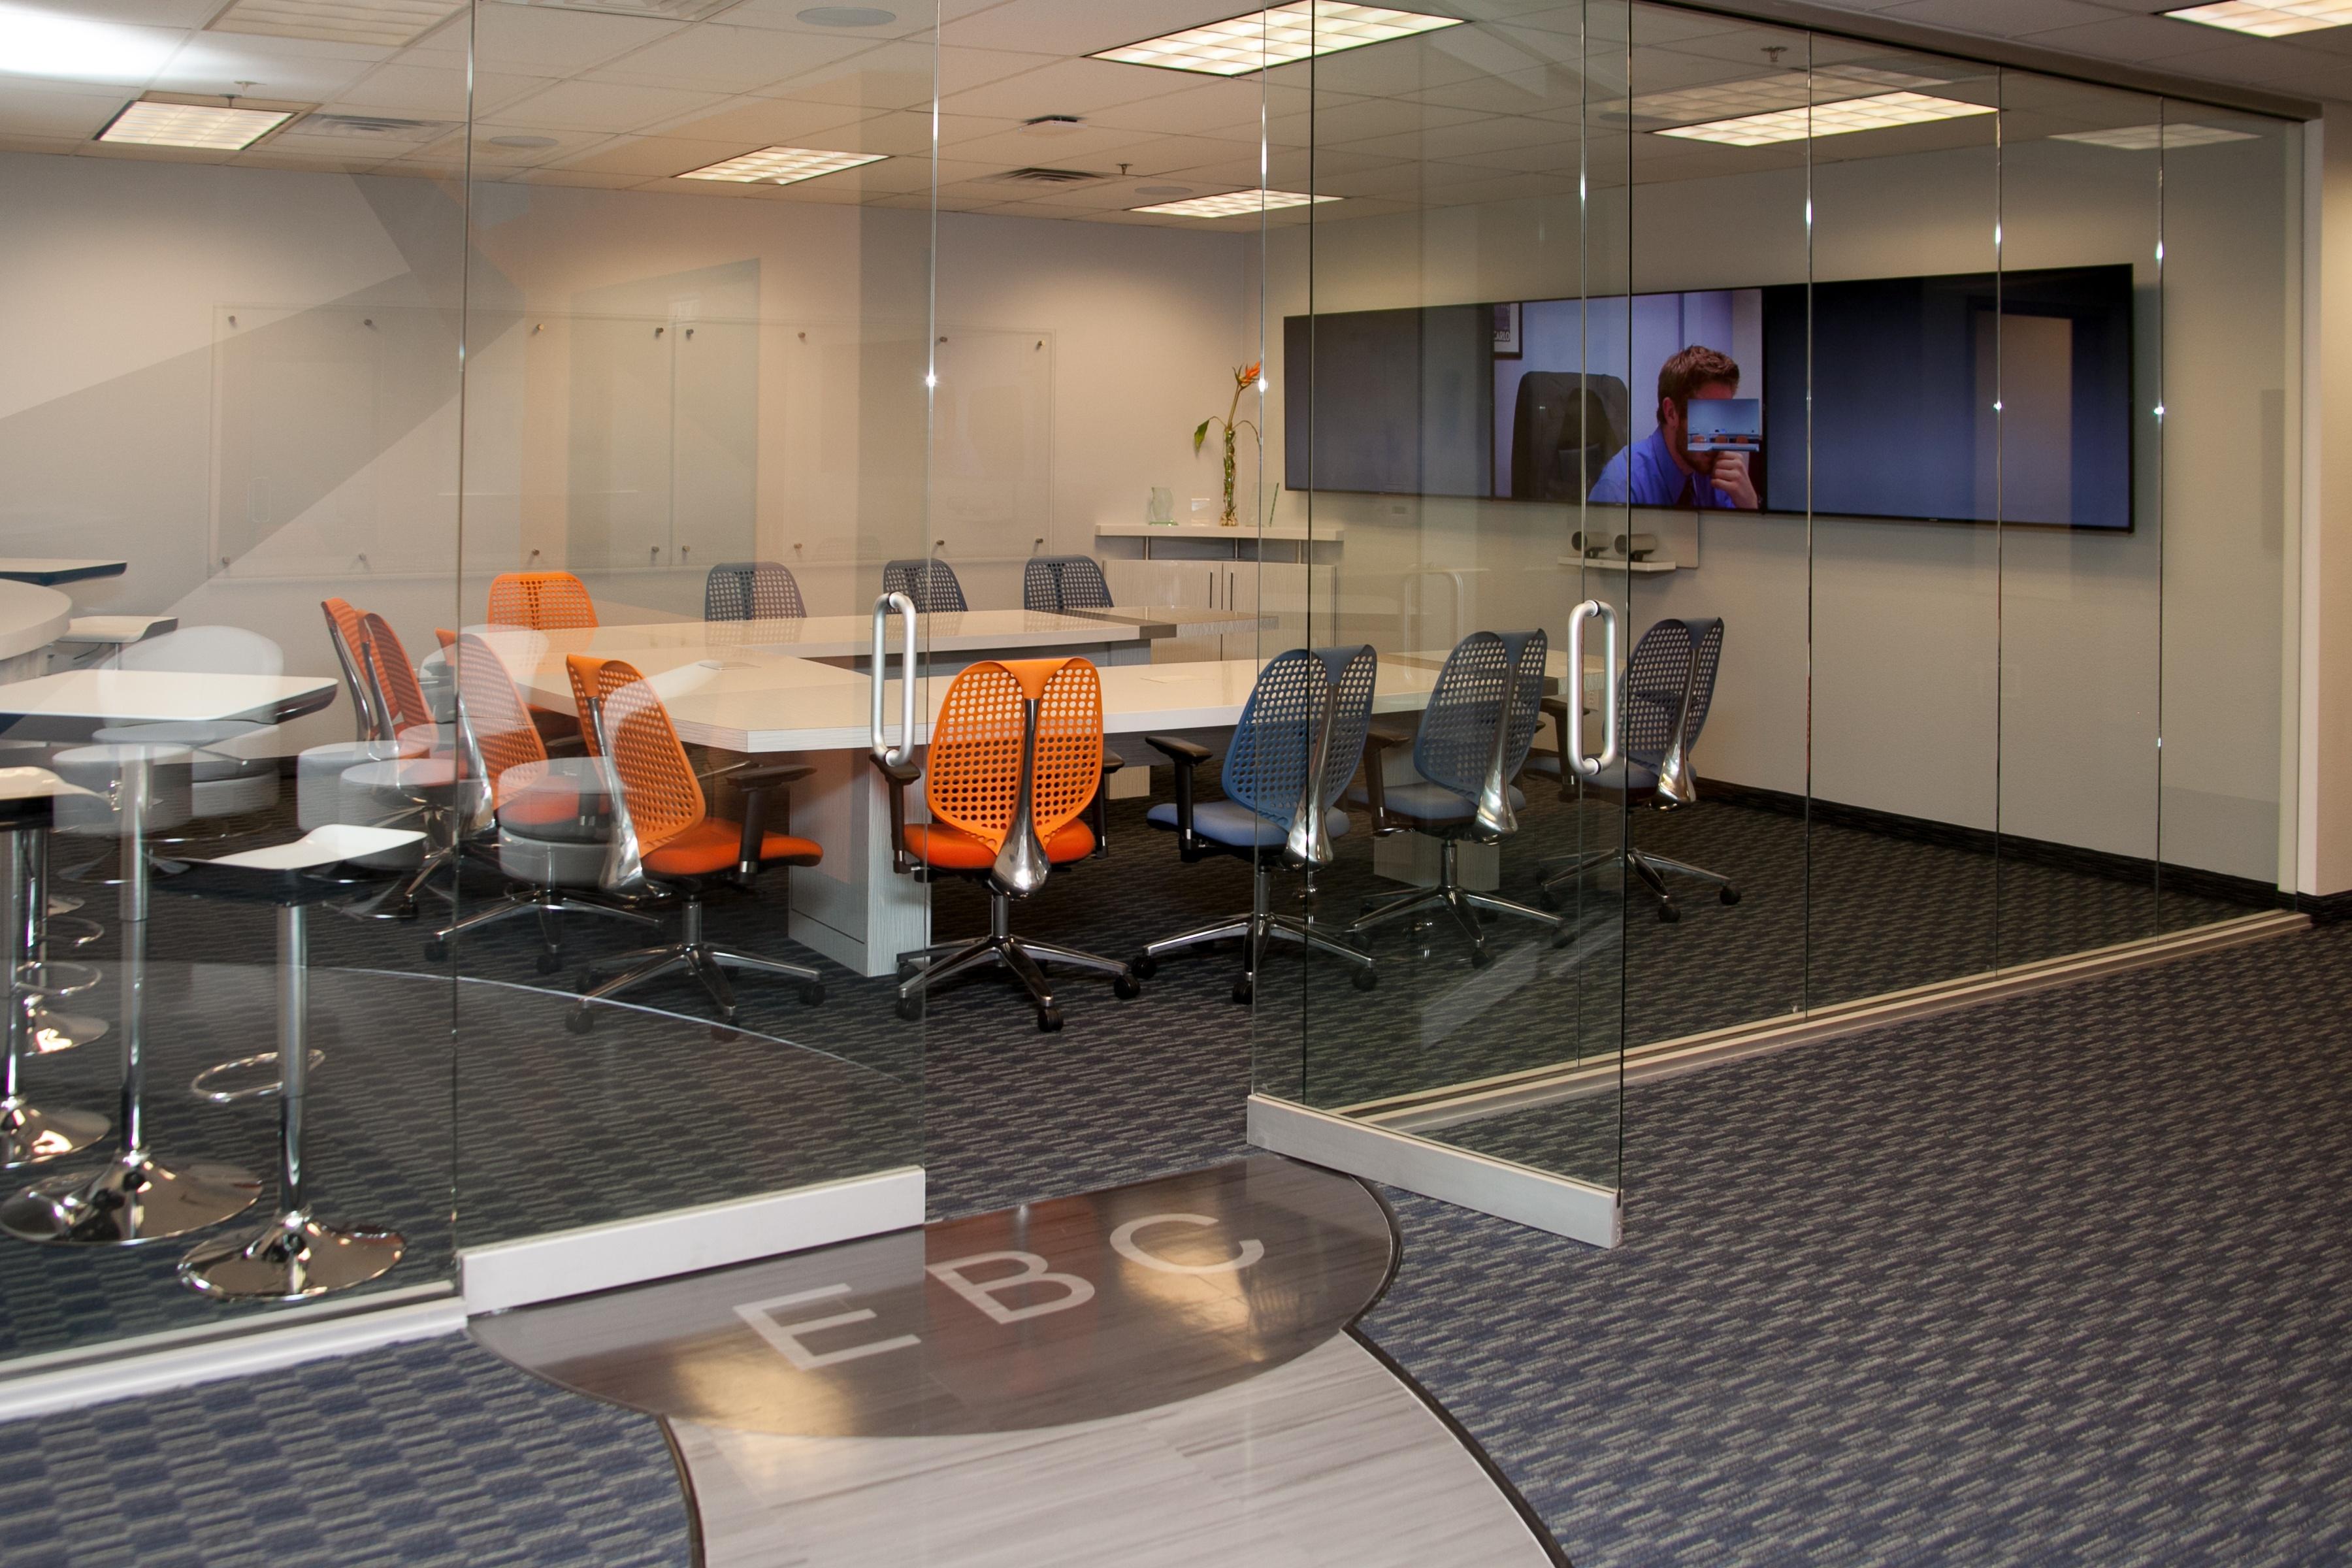 DynTek: A Cisco Gold Partner proficient in Cisco training for gov., edu., and enterprise clients.